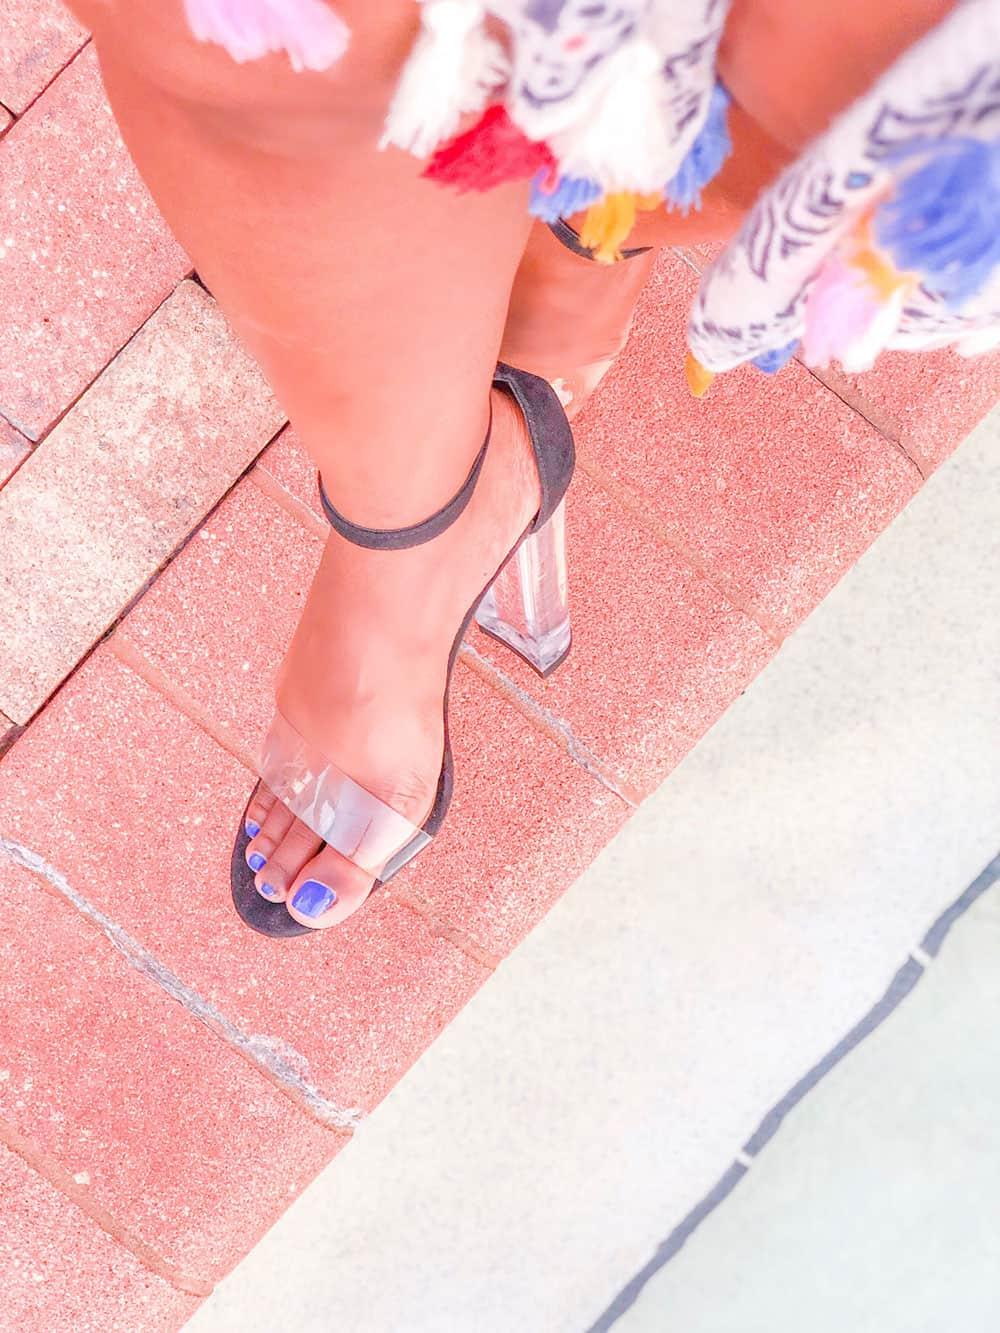 shaunda necole black and clear heels